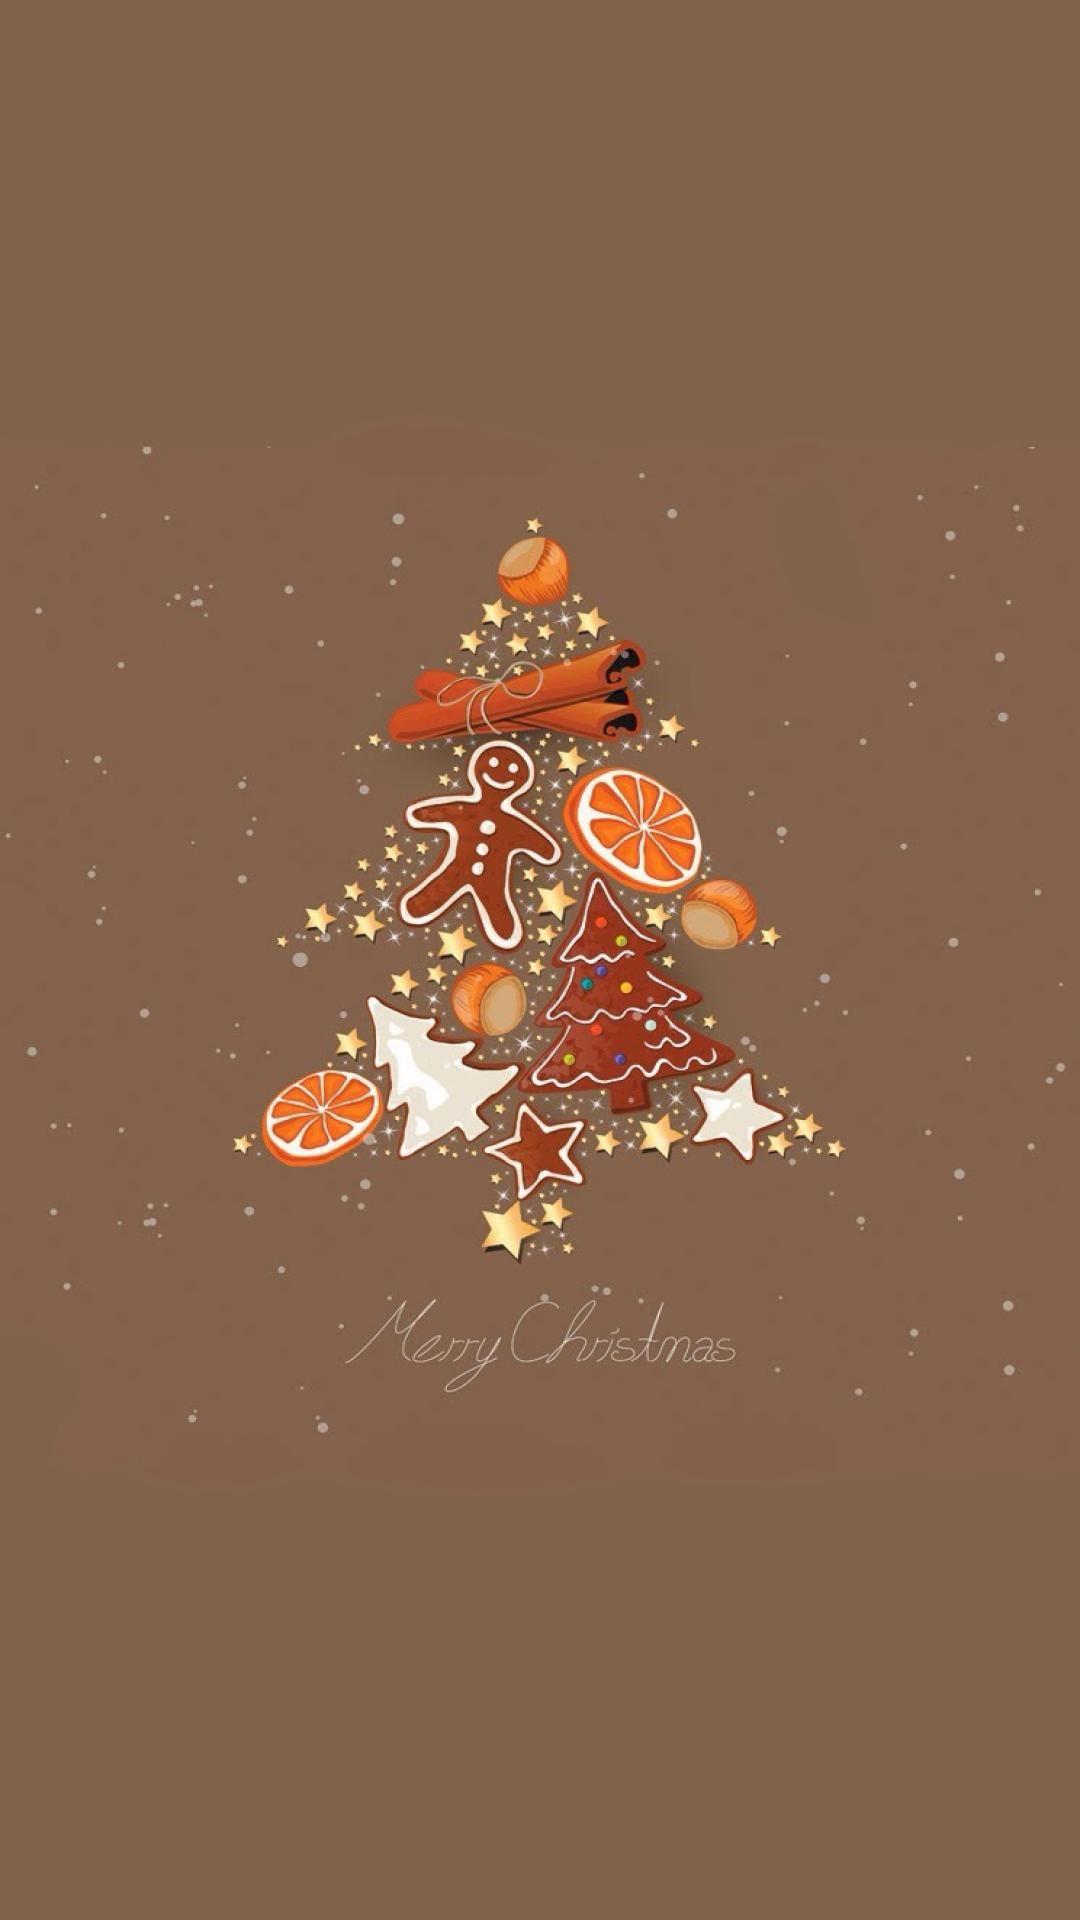 Merry Christmas Xmas Wallpaper Wallpaper Iphone Christmas Cute Christmas Wallpaper